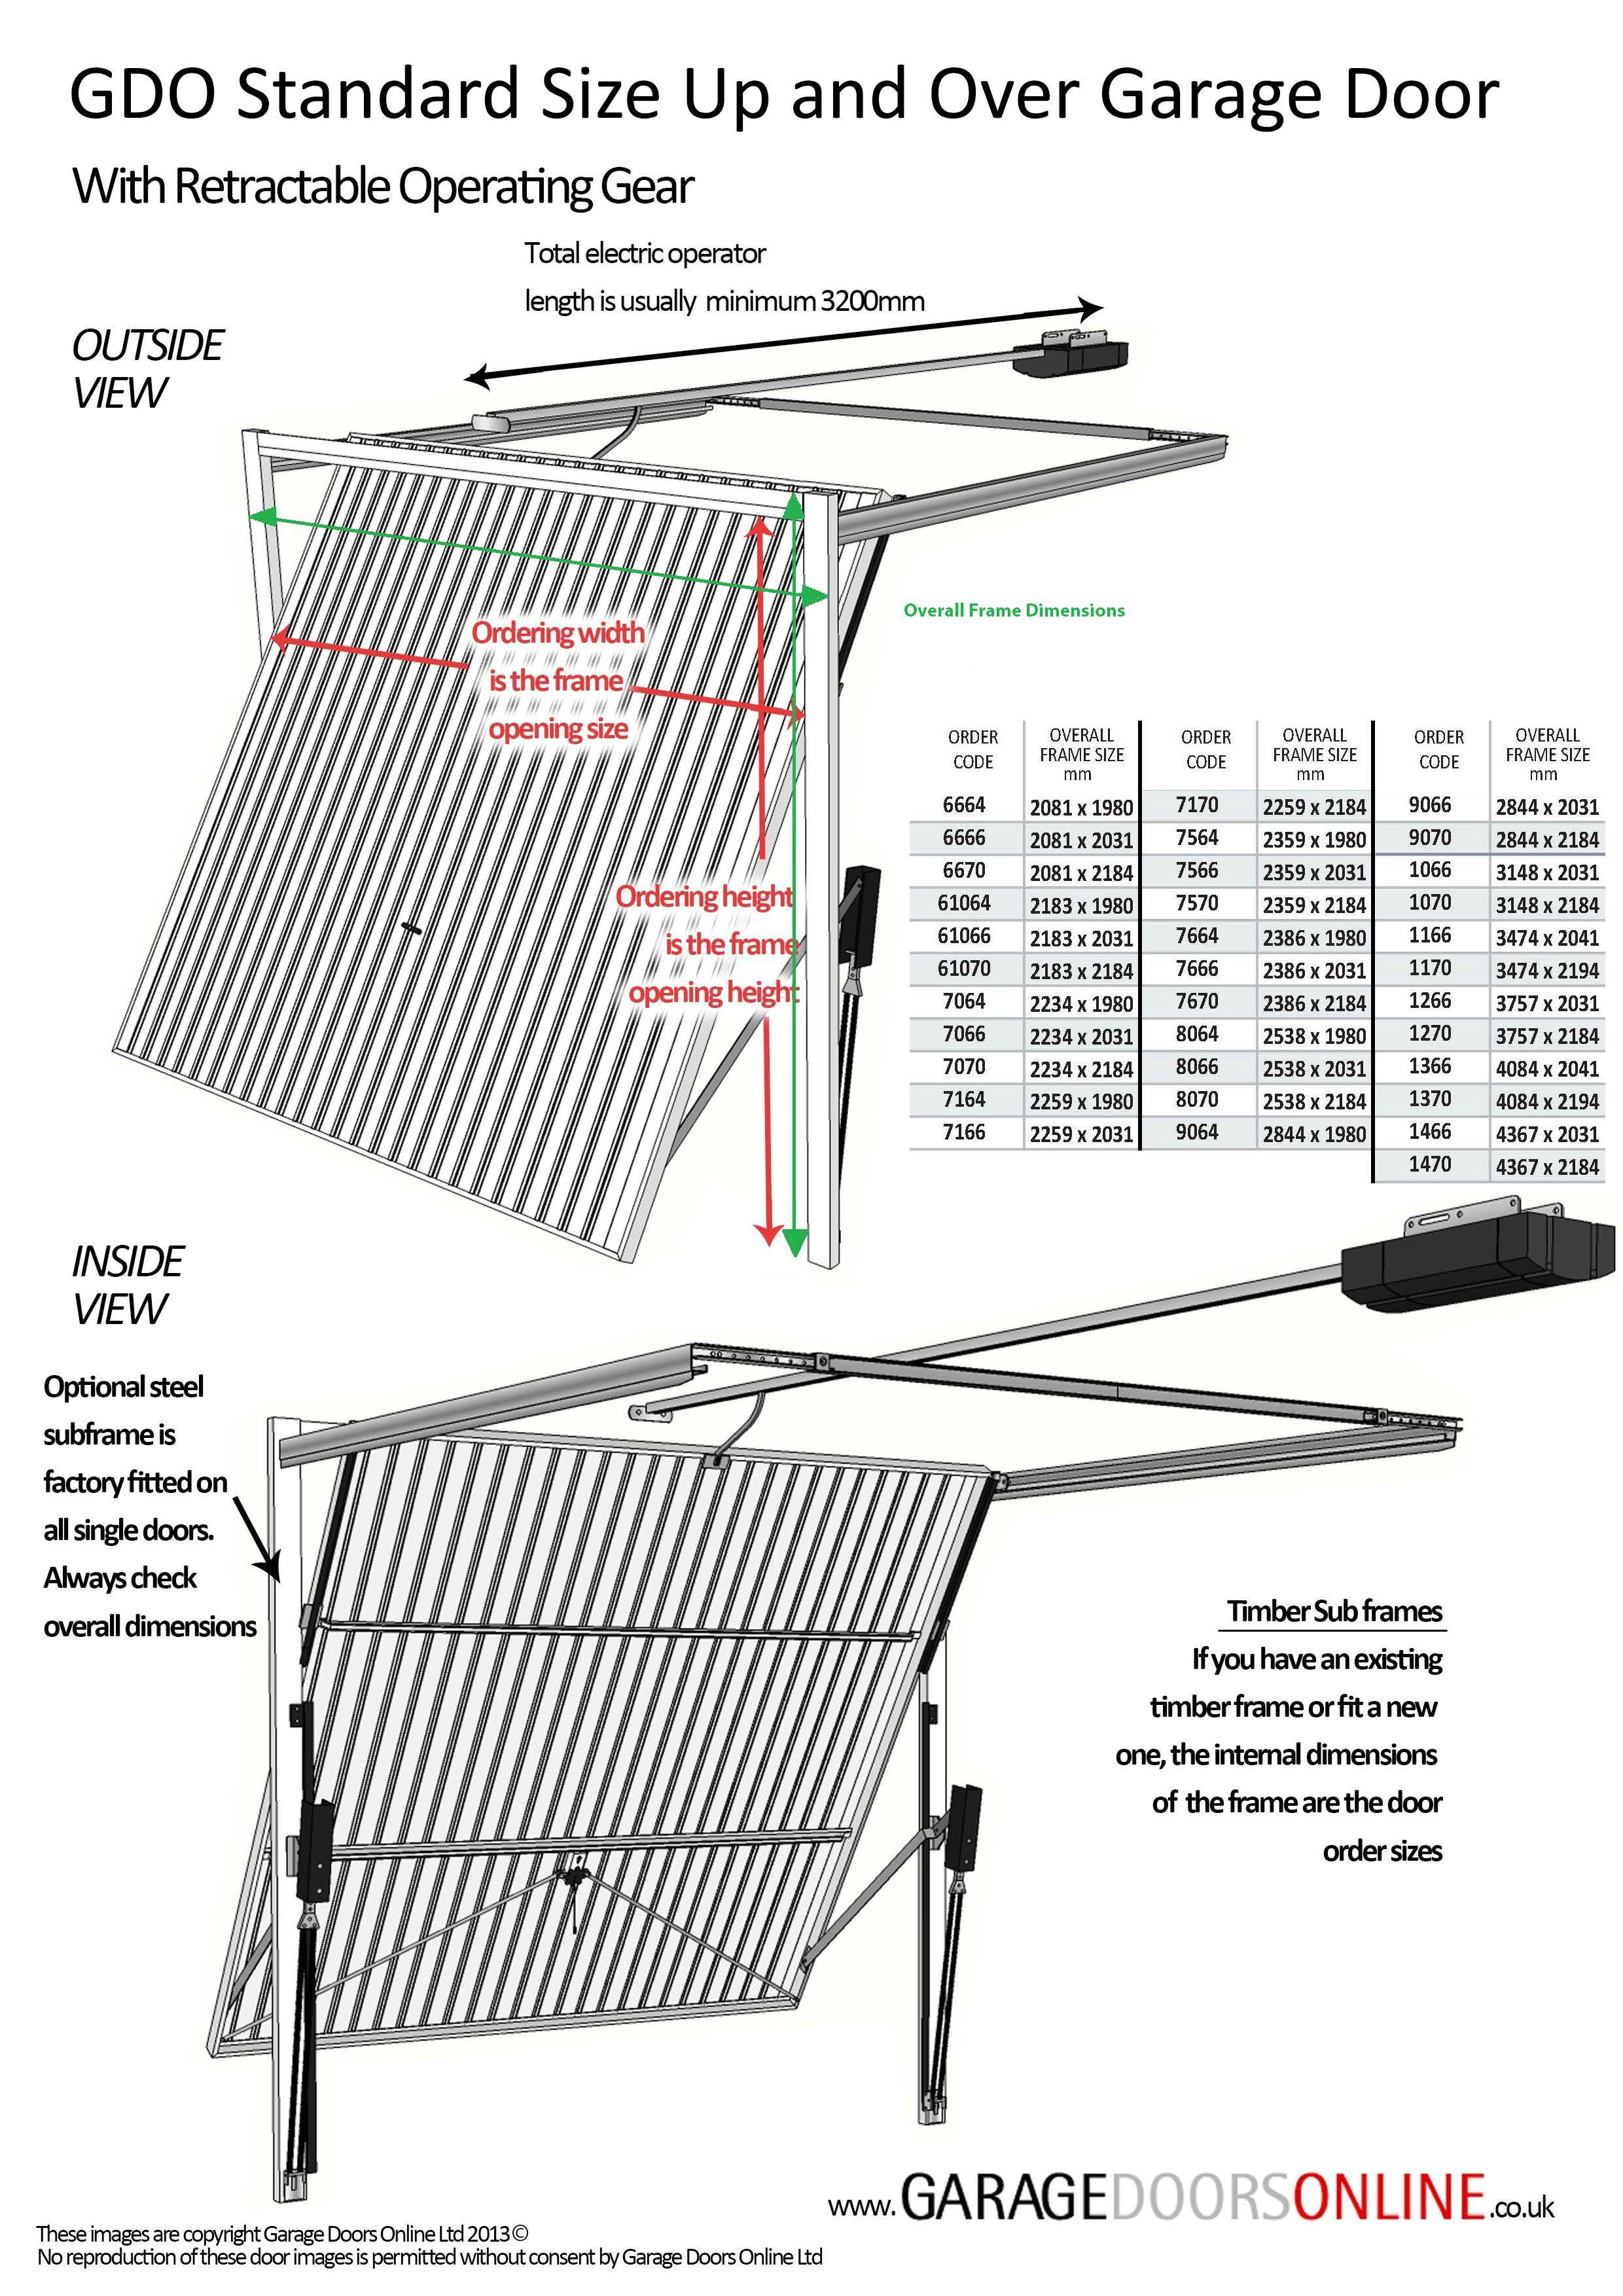 GDO Retractable Up and Over garage door Measuring Guide